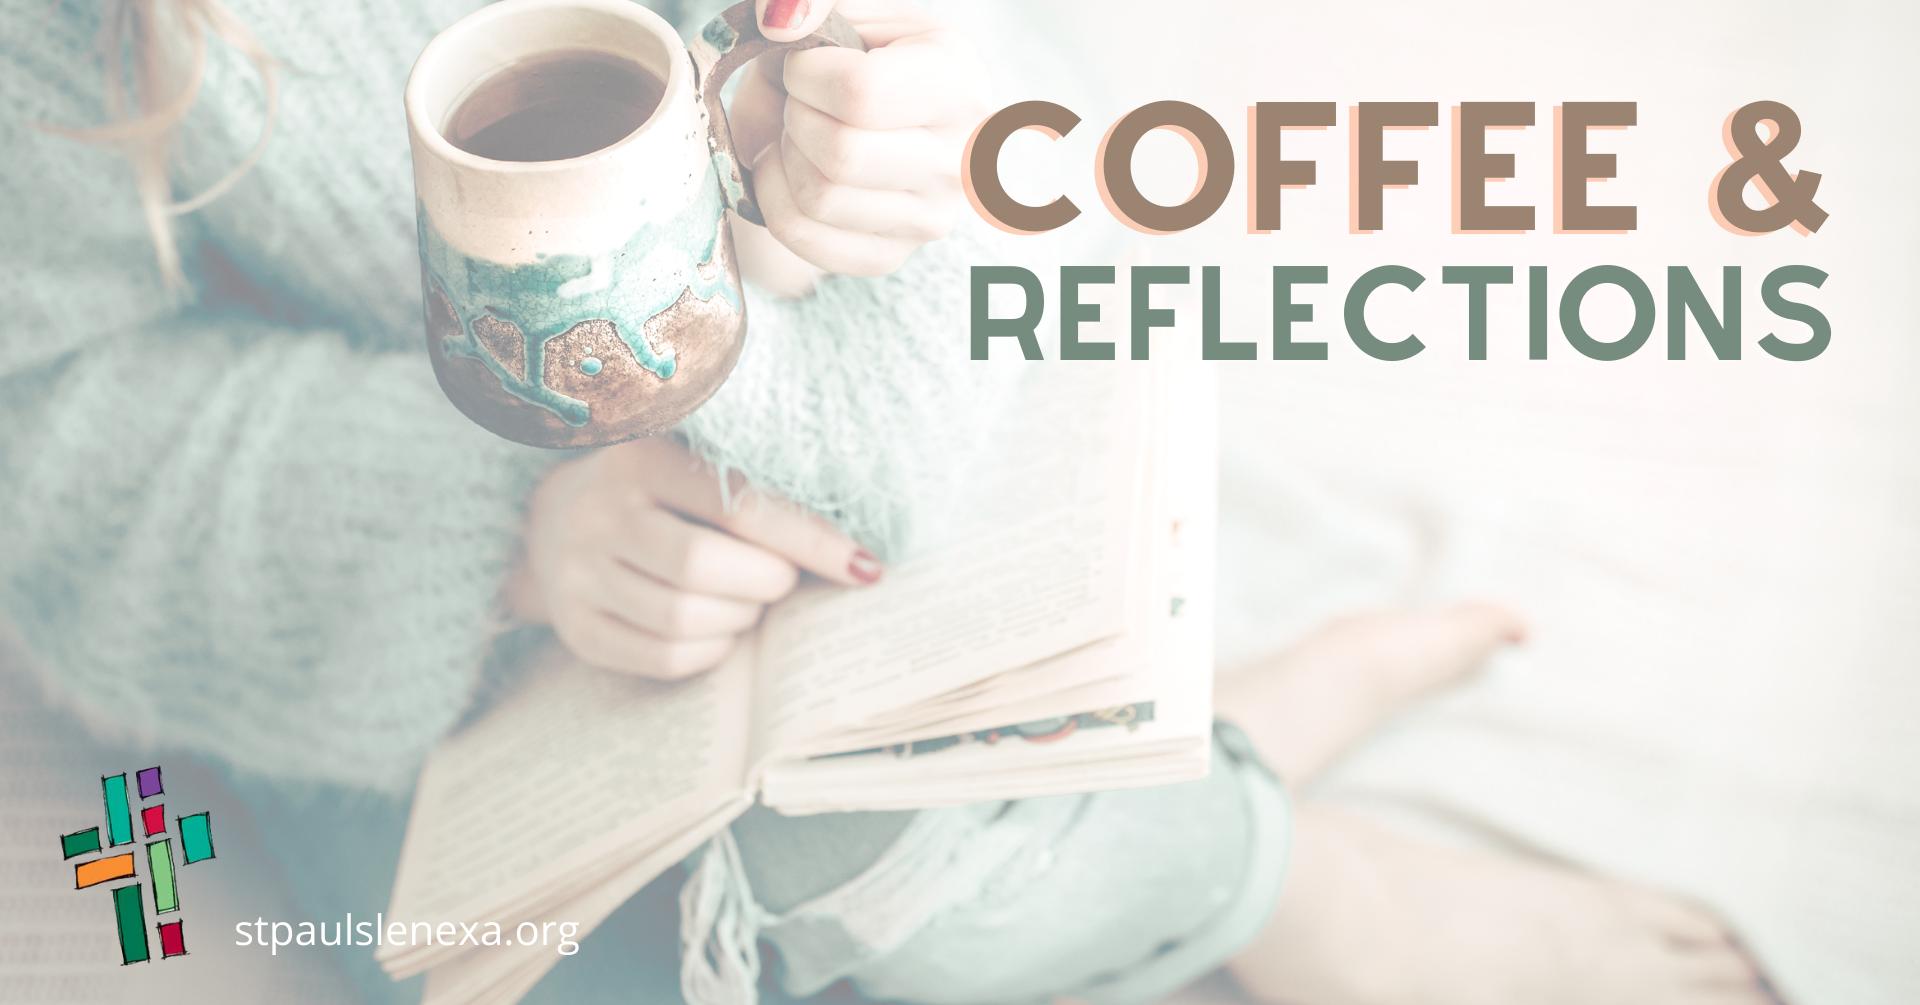 Coffee & Reflections